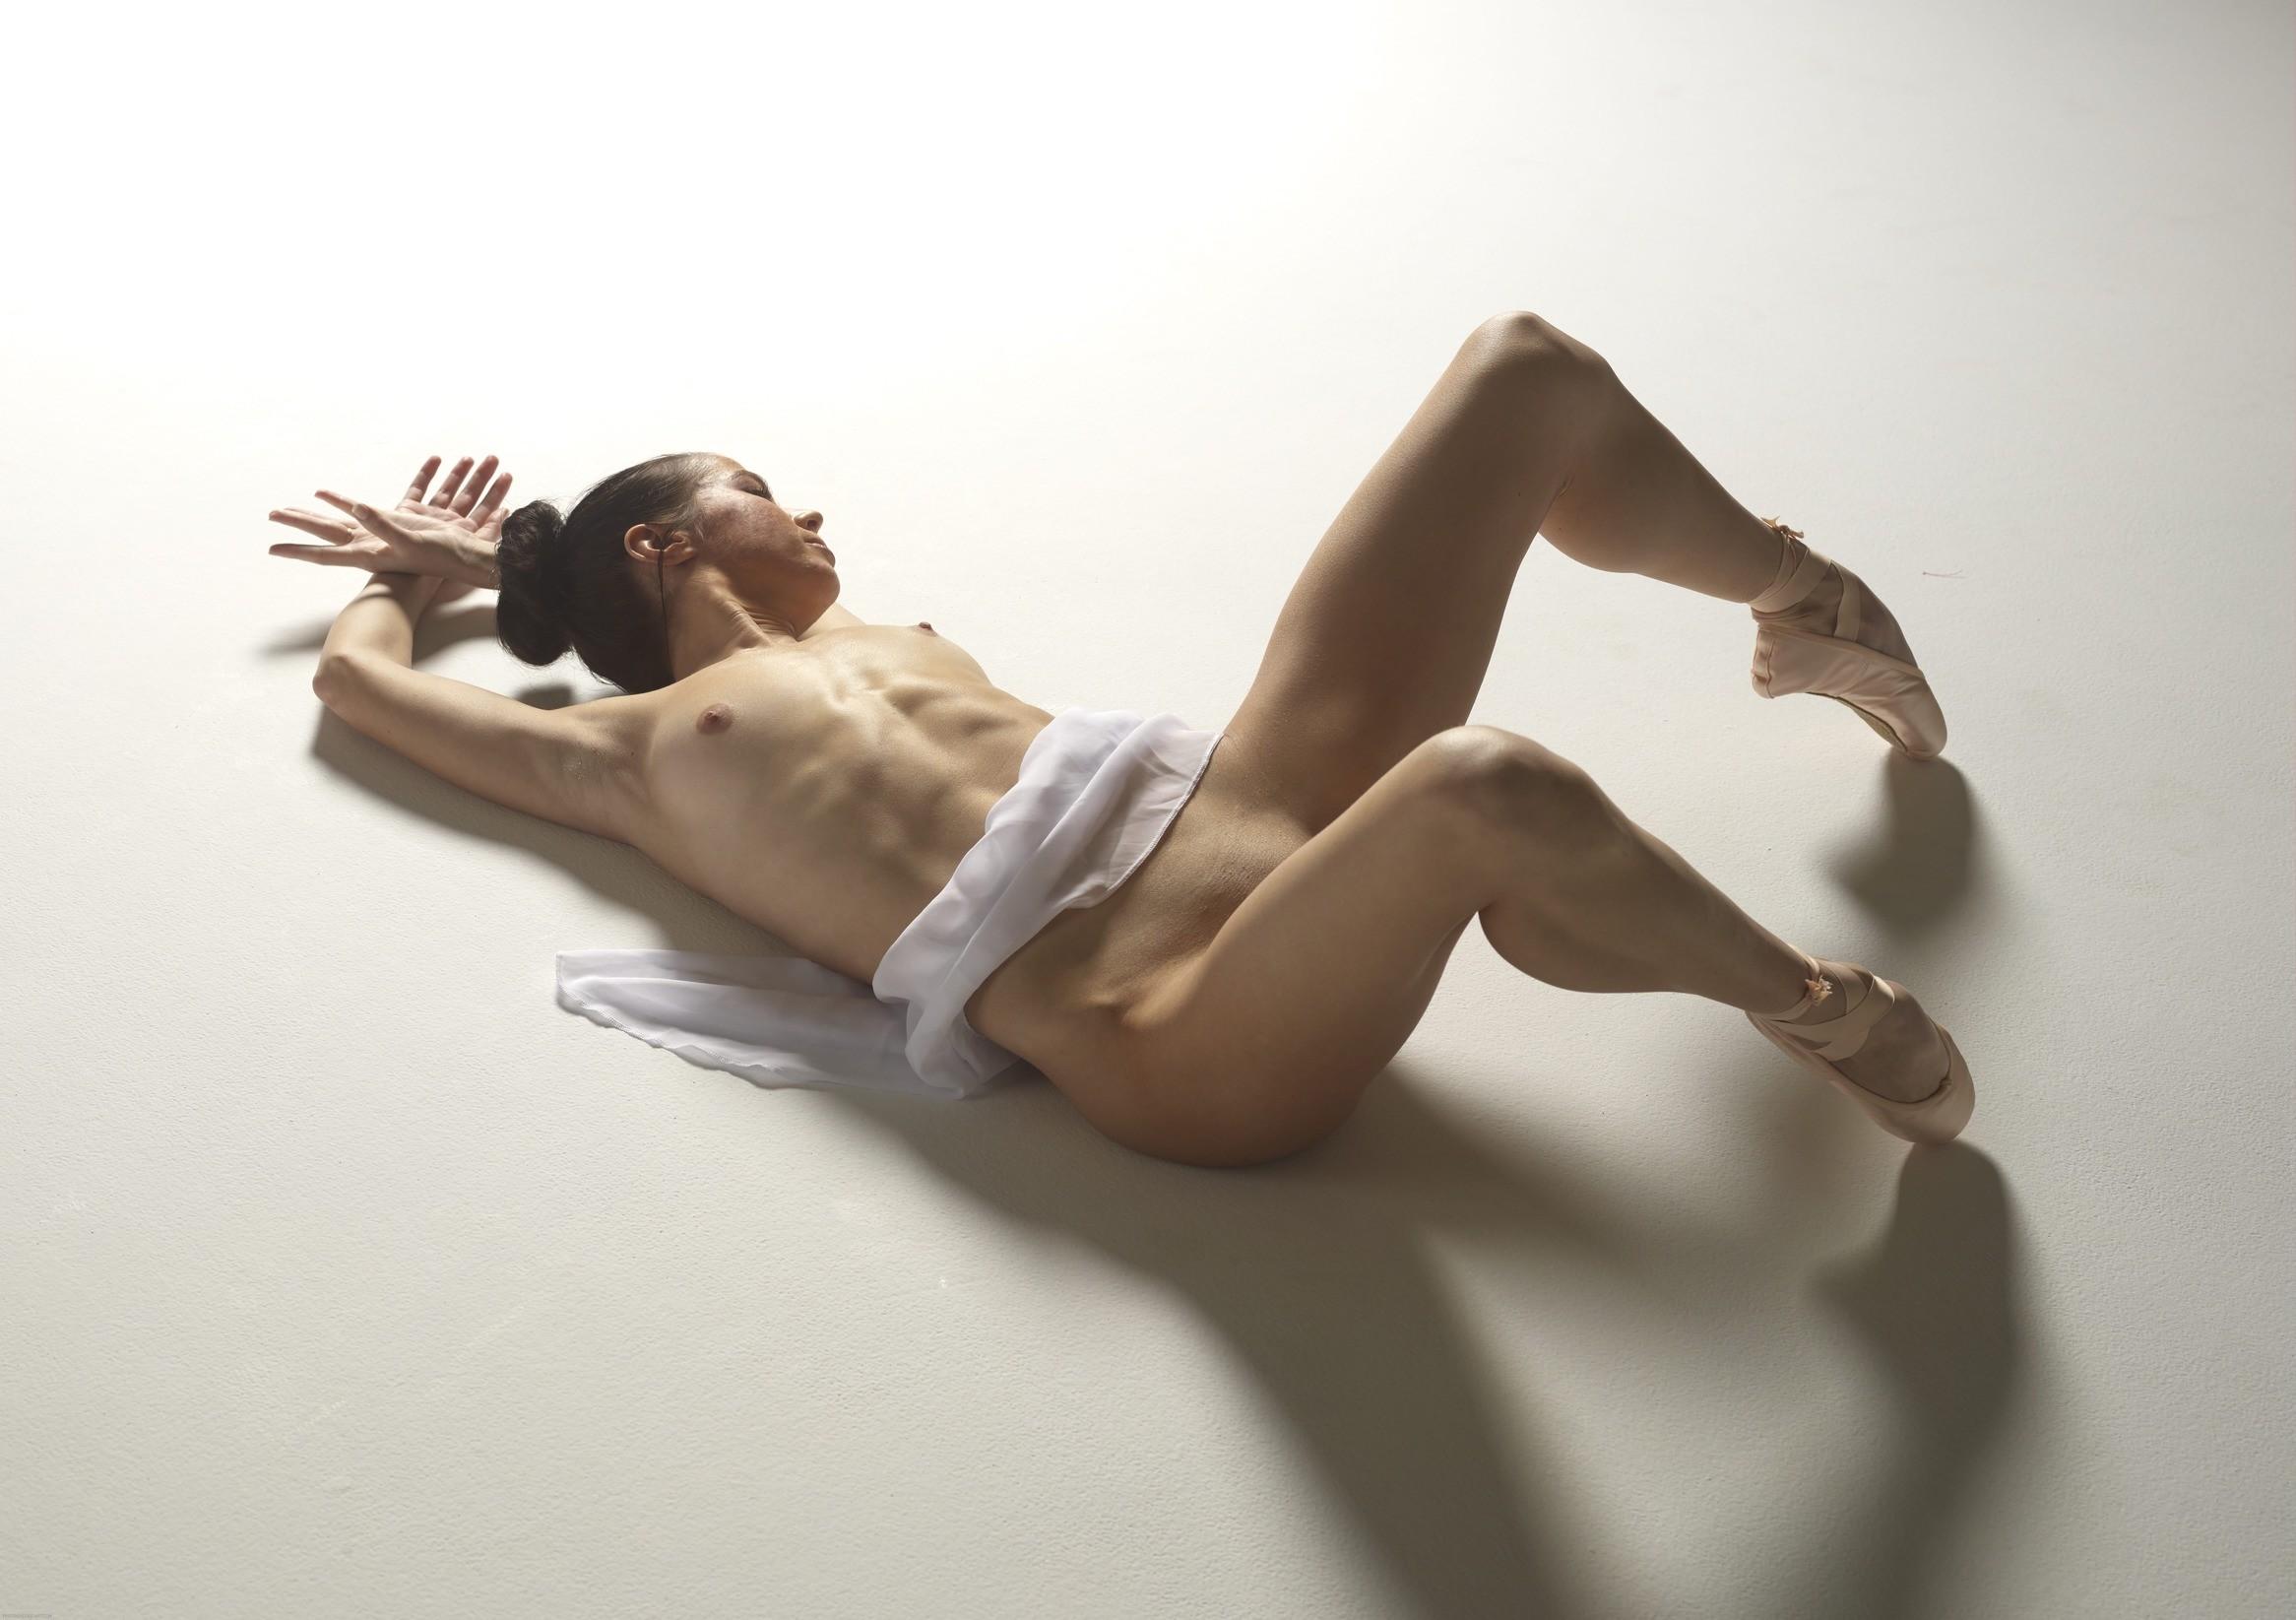 Девушка без трусов раздвигает ноги в шпагат - фото